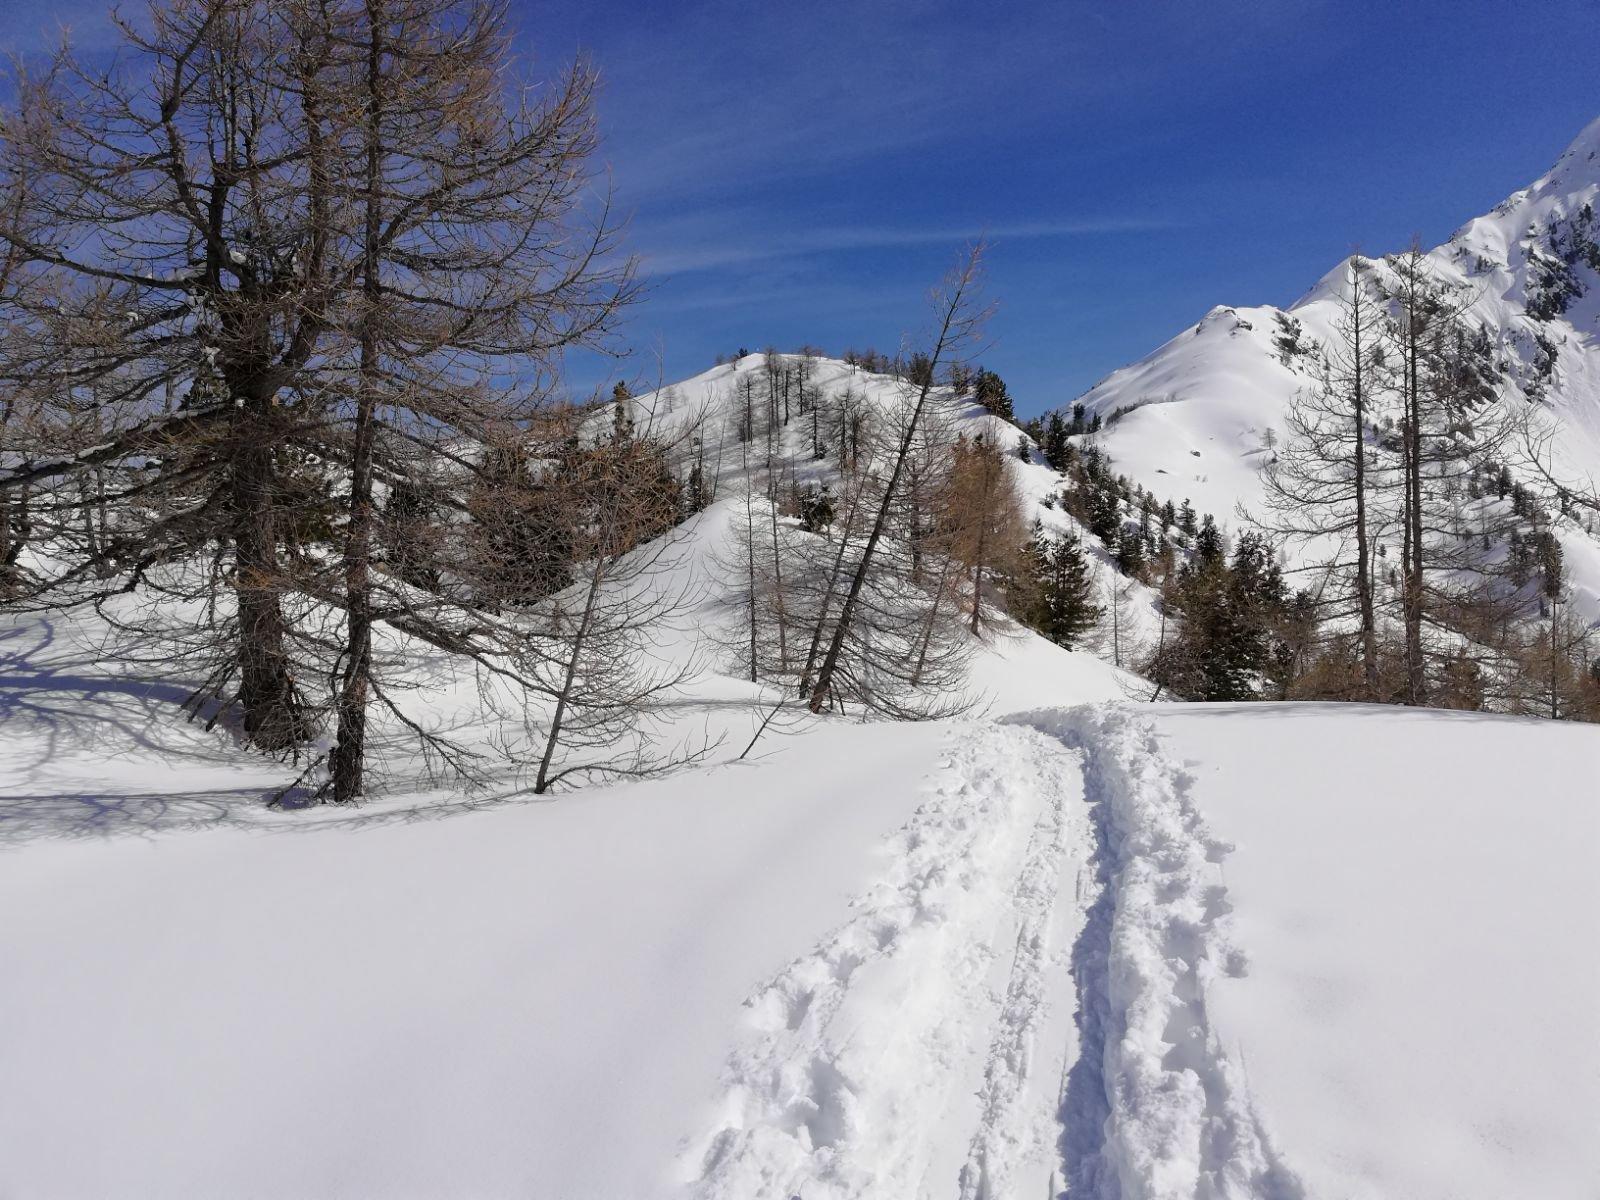 Leretta (Punta) e quota 2051 m da Pian Coumarial, anello 2018-03-22